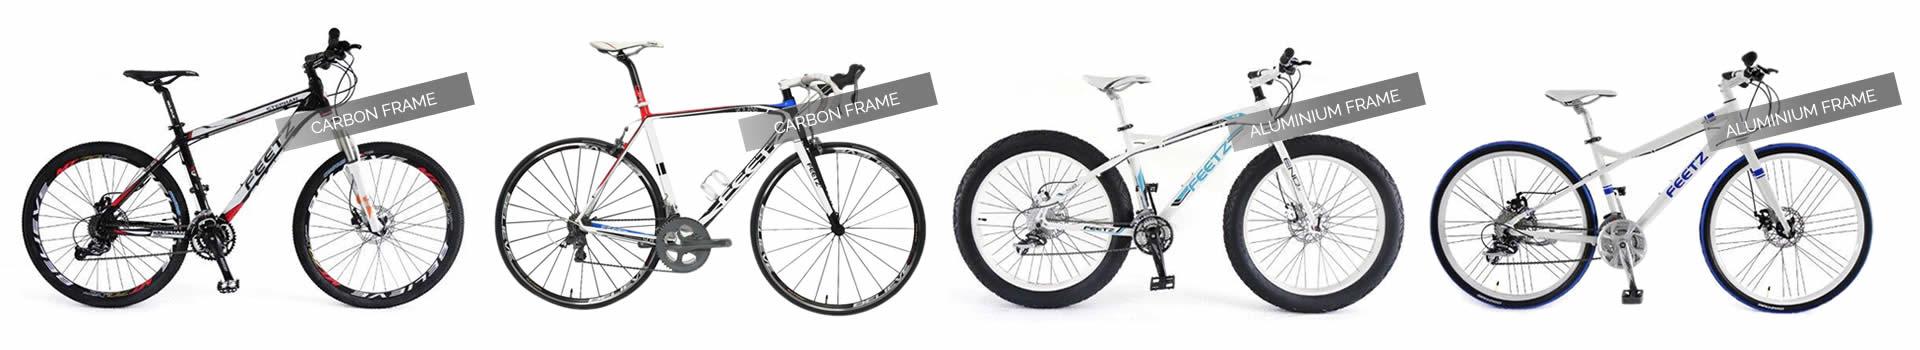 tailormade-bikes